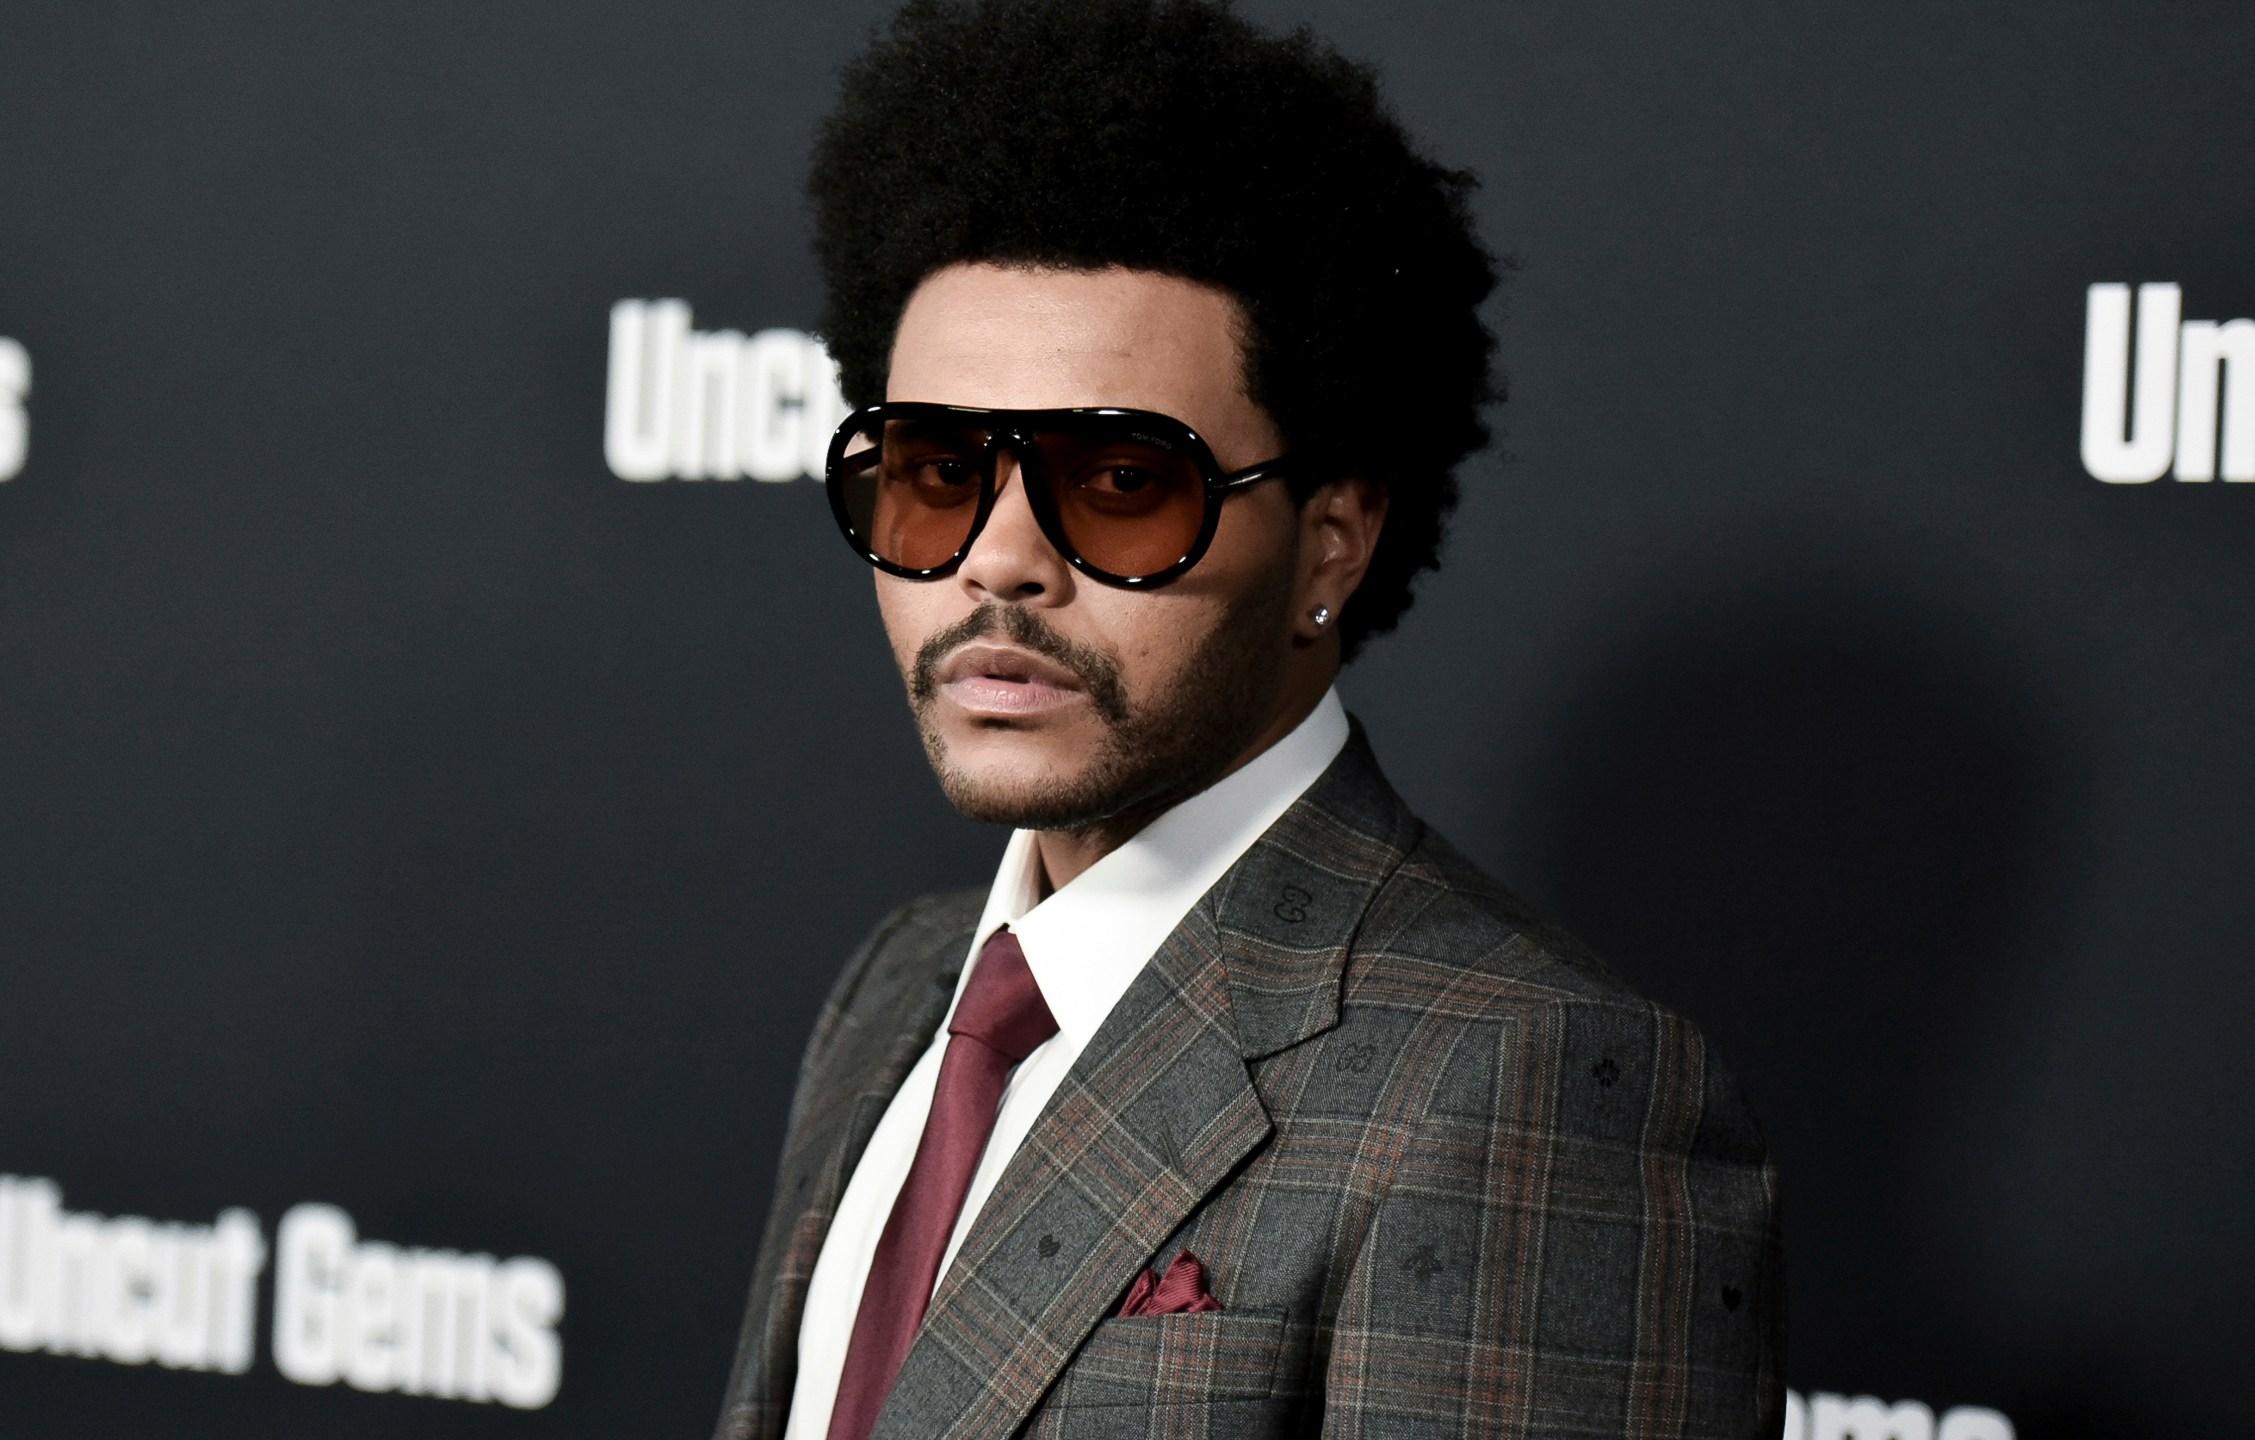 The Weeknd, Abel Makkonen Tesfaye